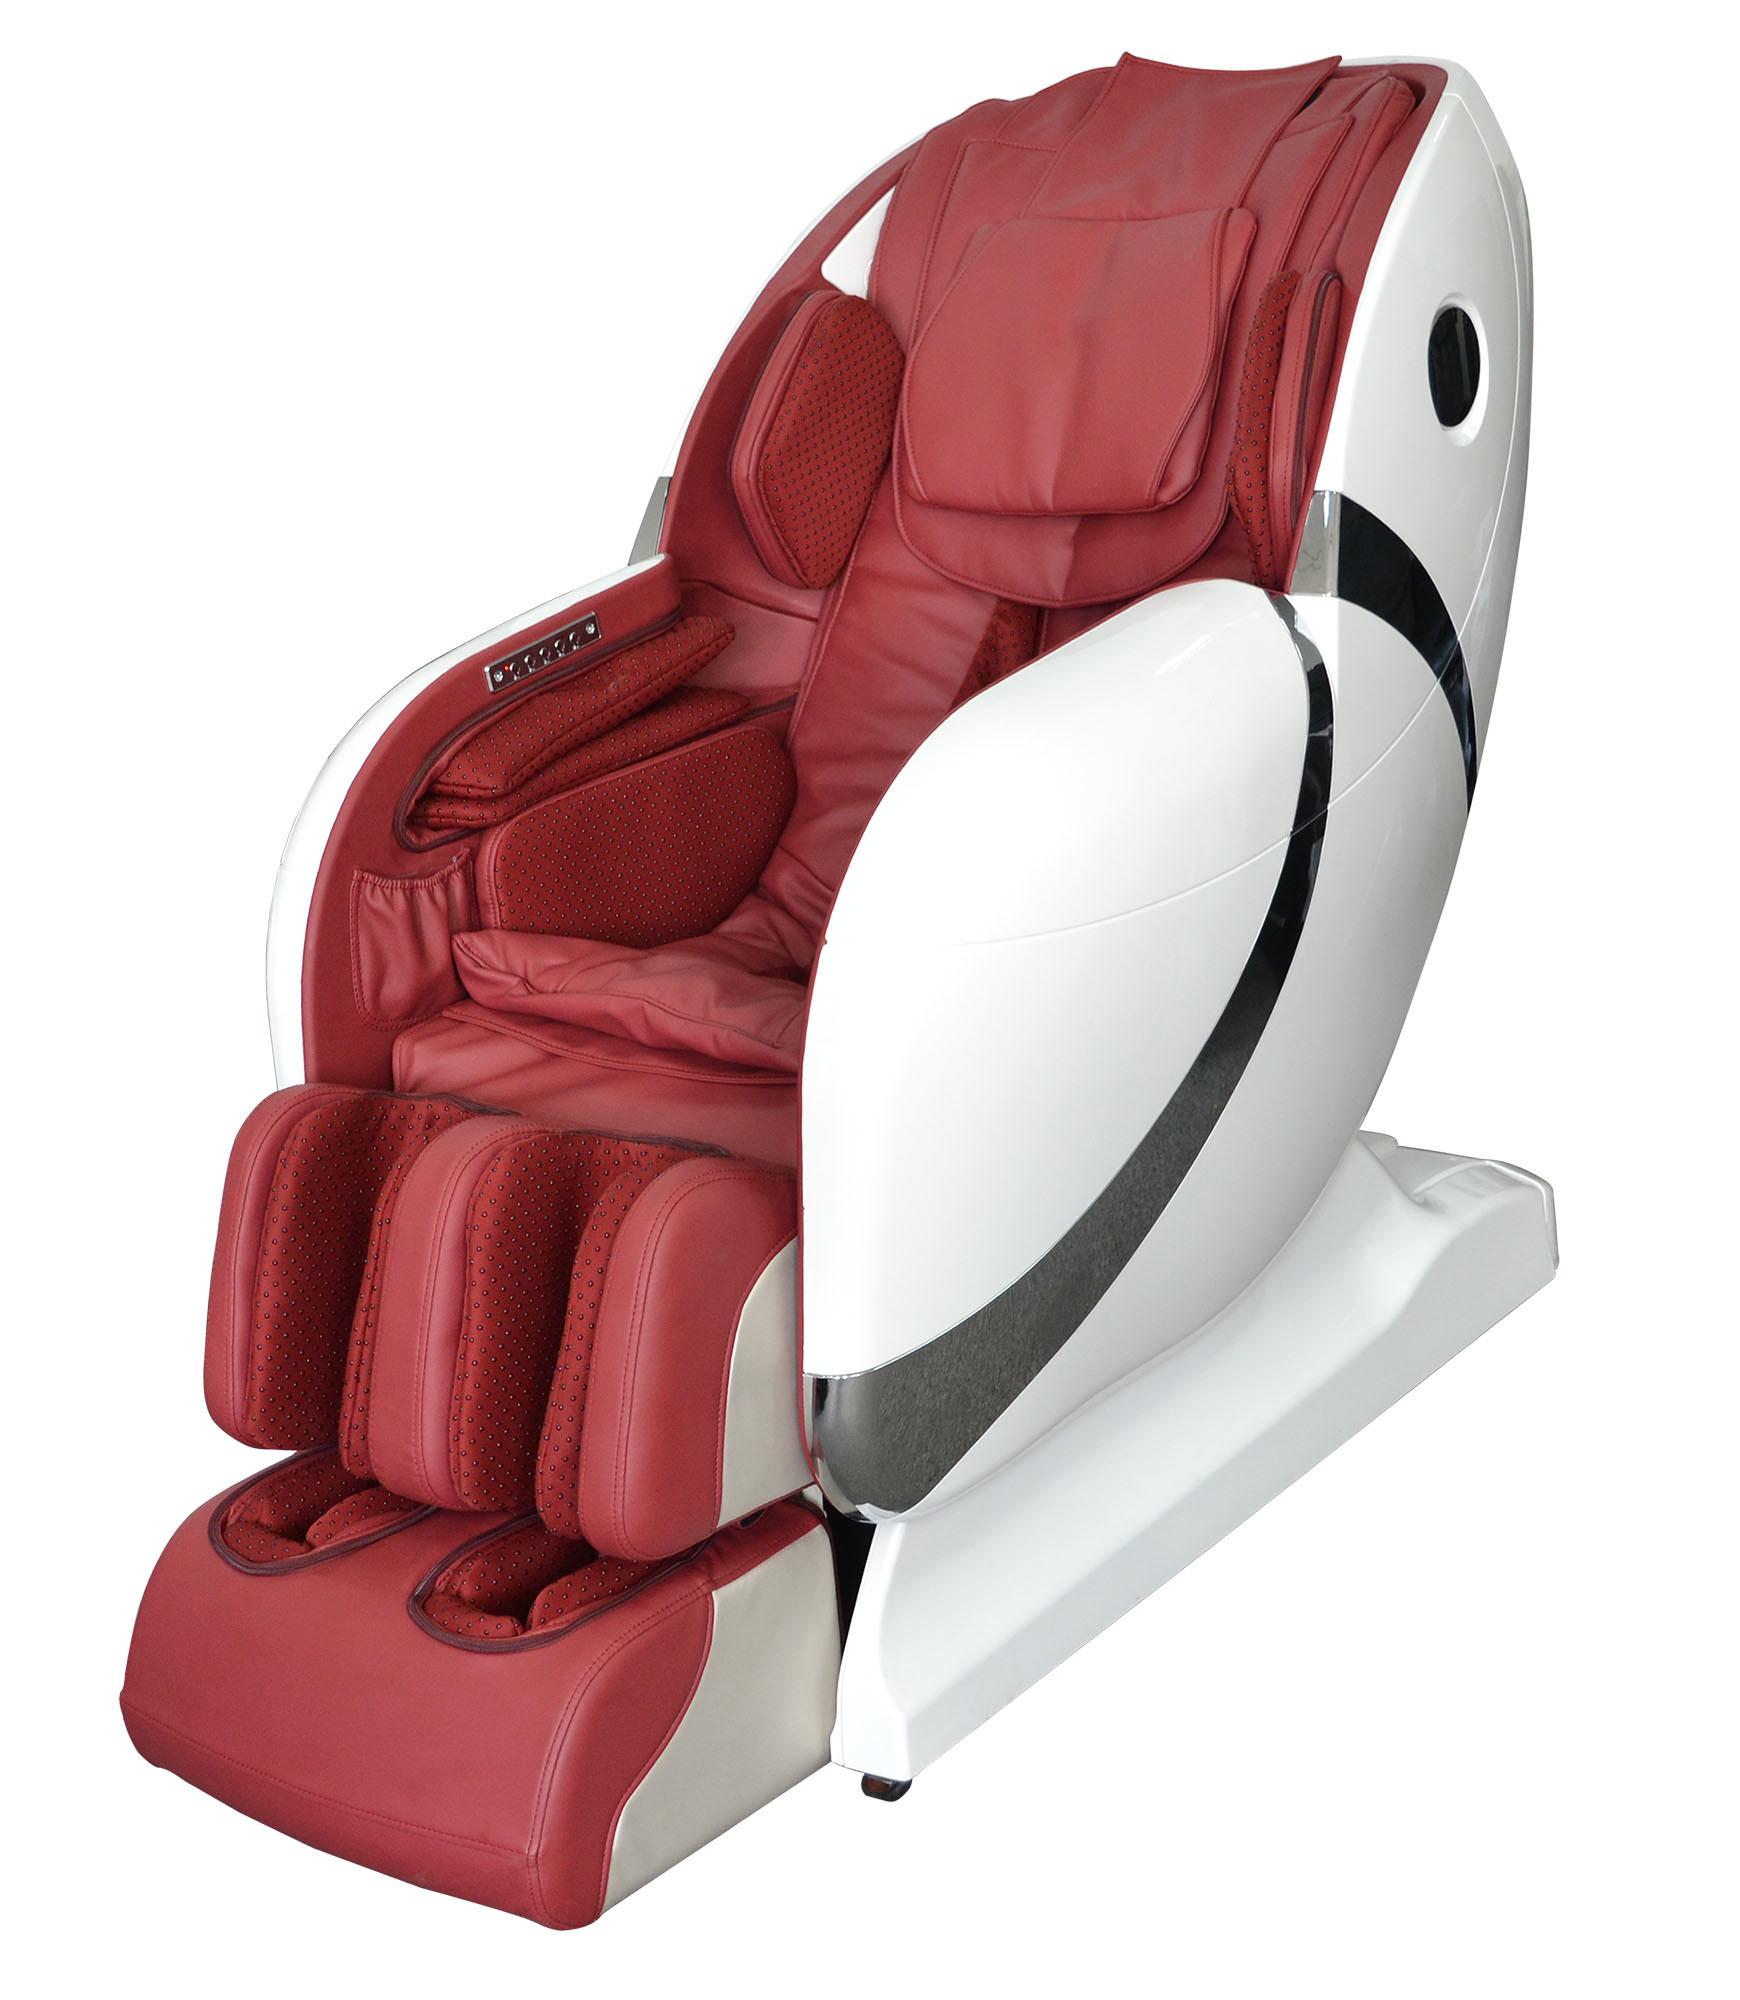 New Zero Gravity Luxury Massage Chair with SL-Track